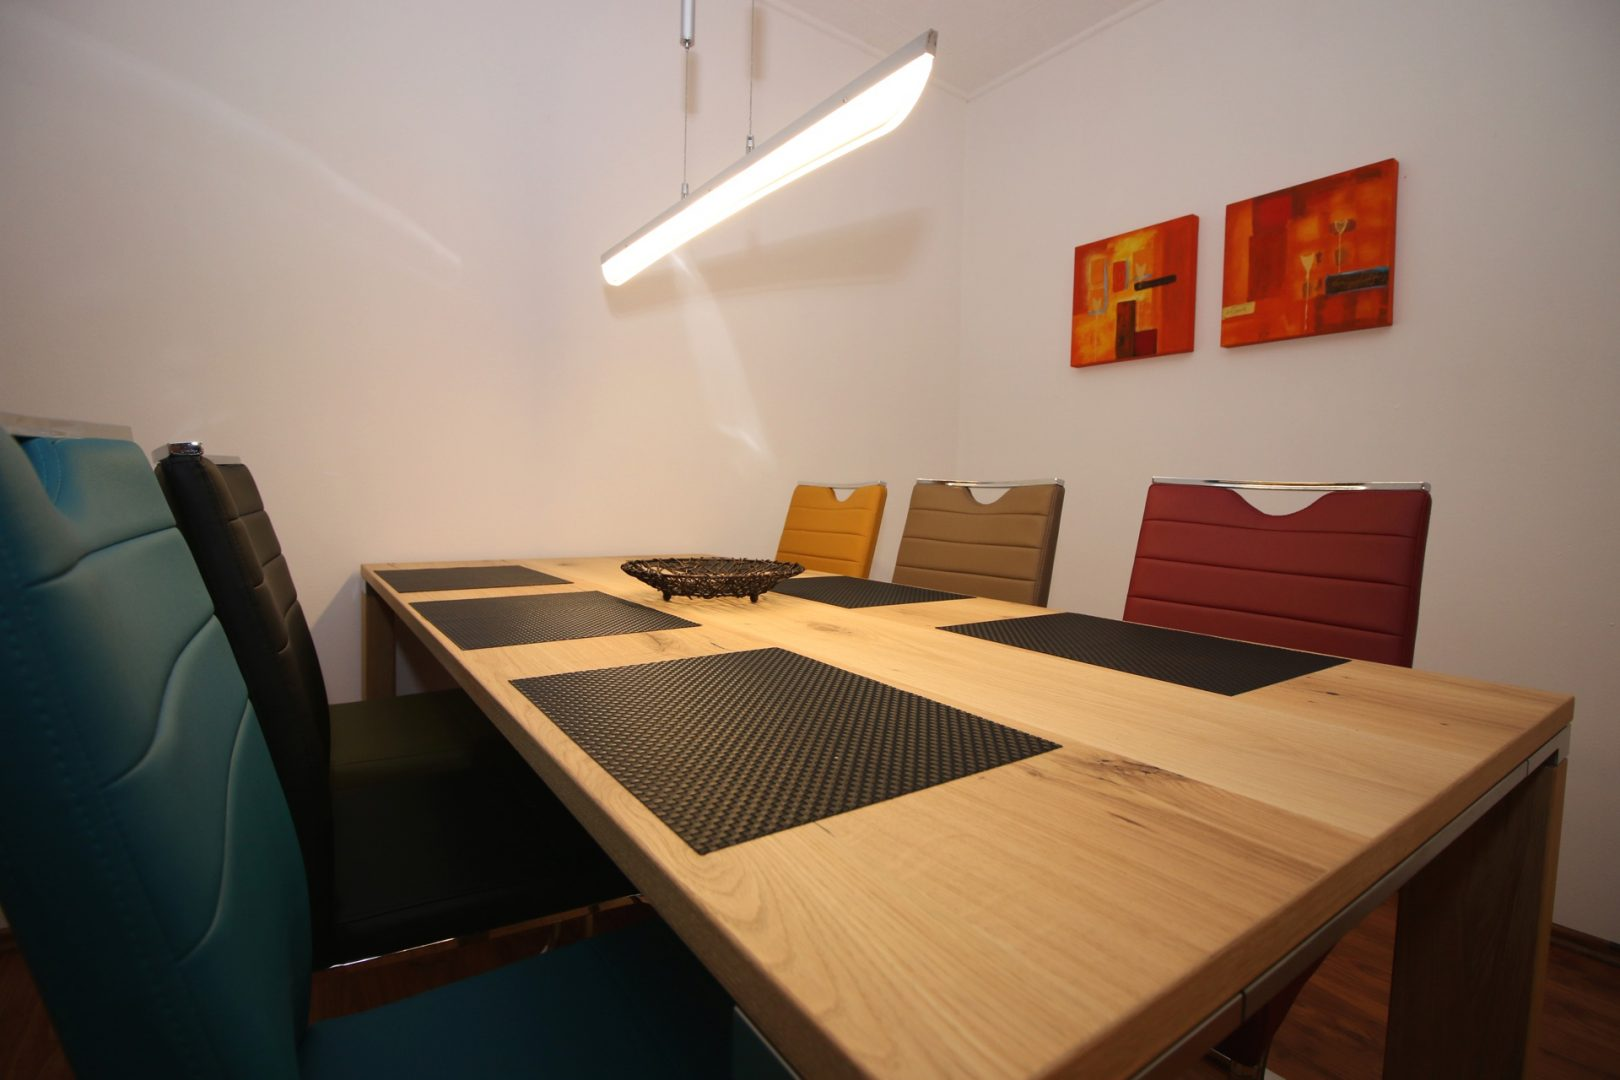 germina apart 1 0 f r max 2 personen germina apart oberhof. Black Bedroom Furniture Sets. Home Design Ideas